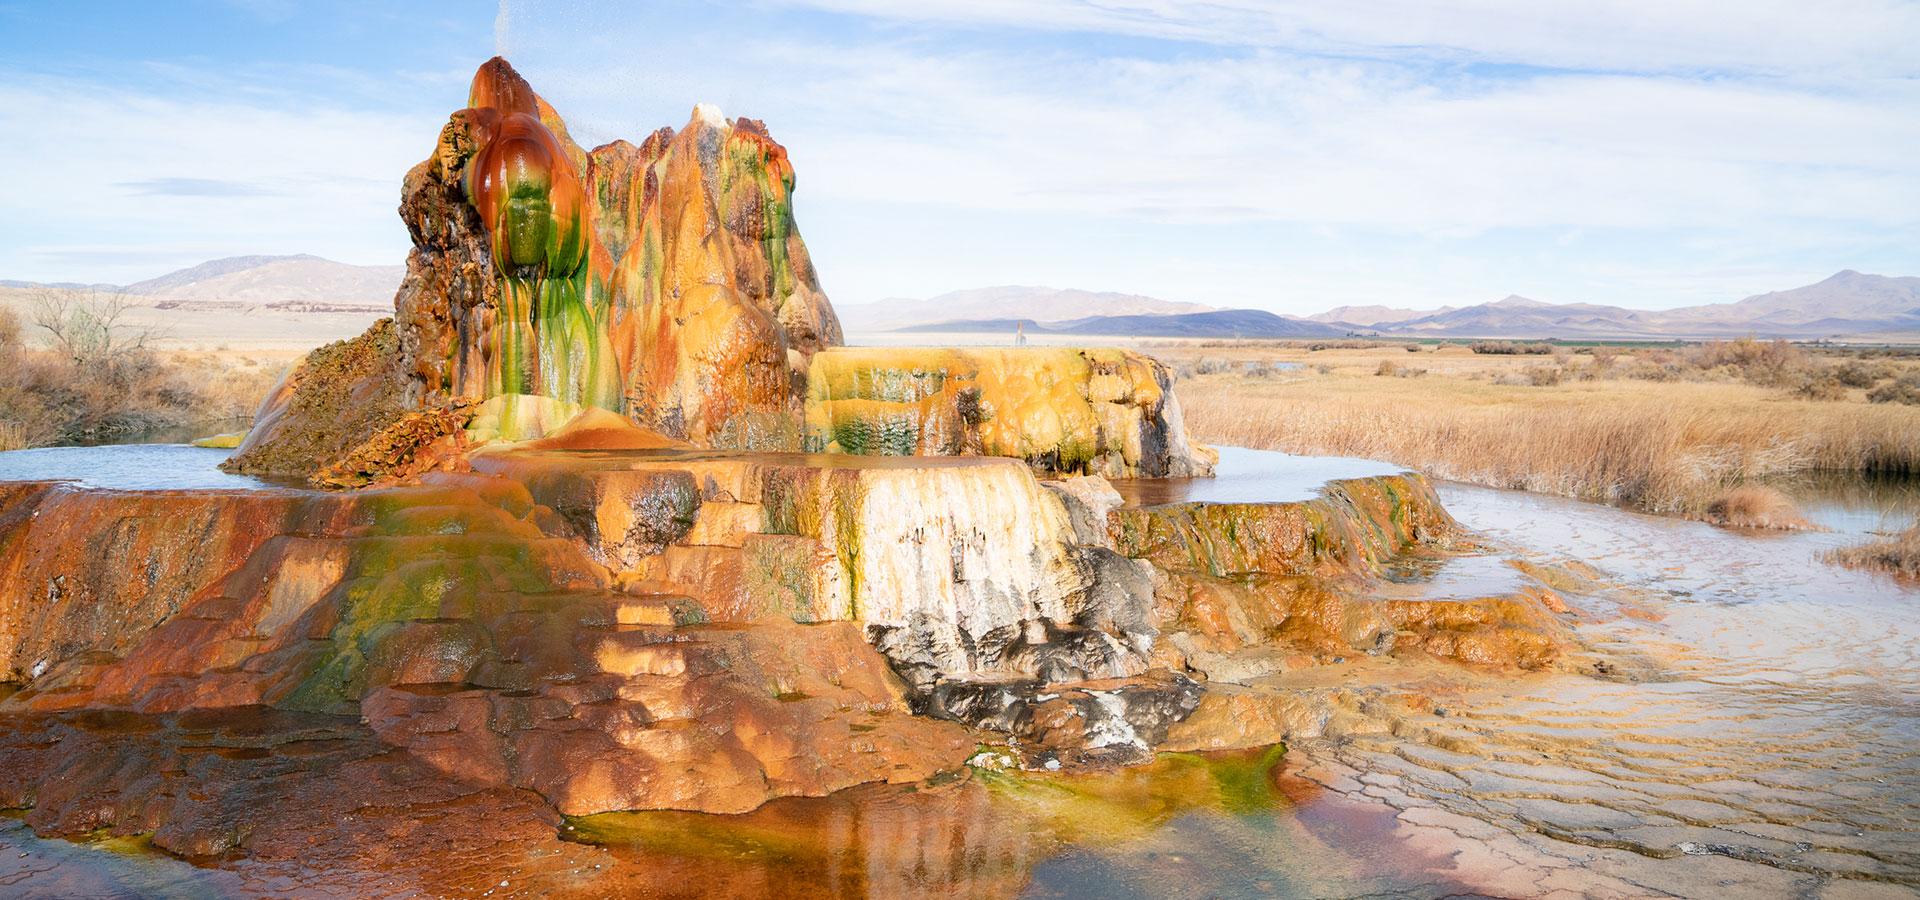 Jess and Quin Fly Geyser Black Rock Desert